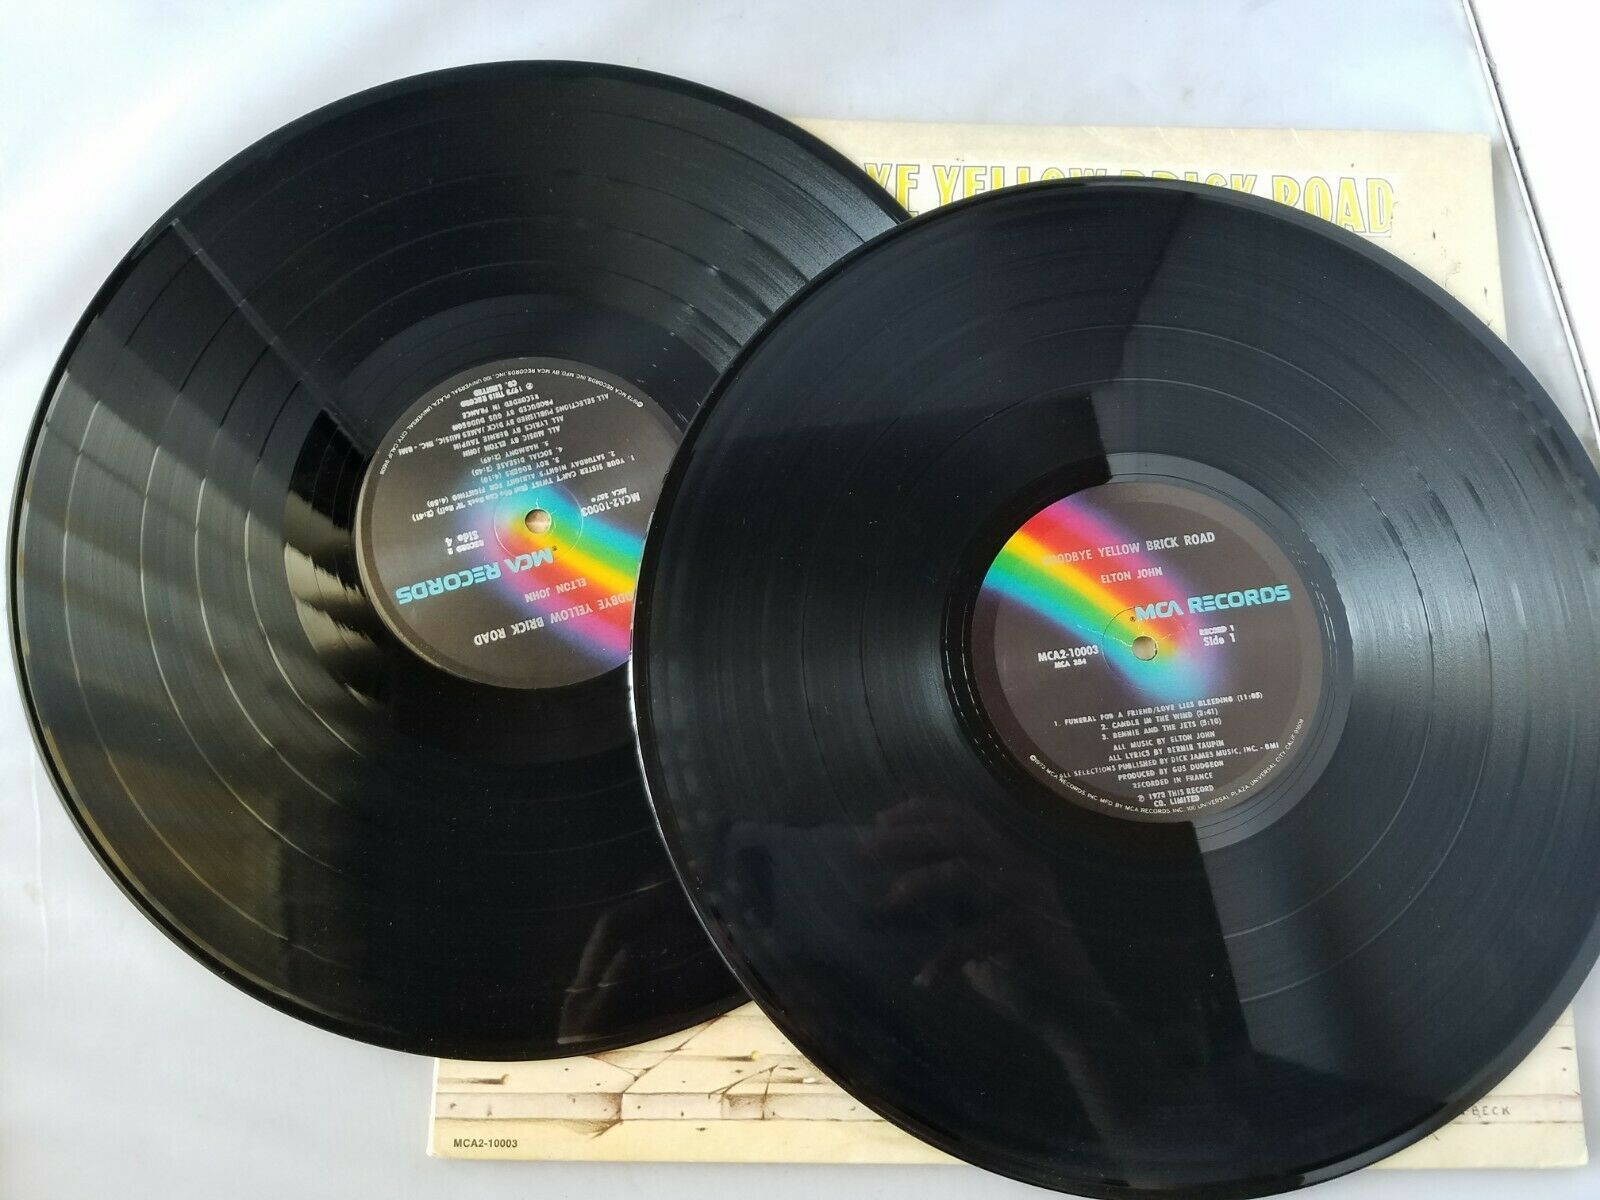 Elton John Yellow Brick Road Disque Vinyle Vintage 1973 MCA Records